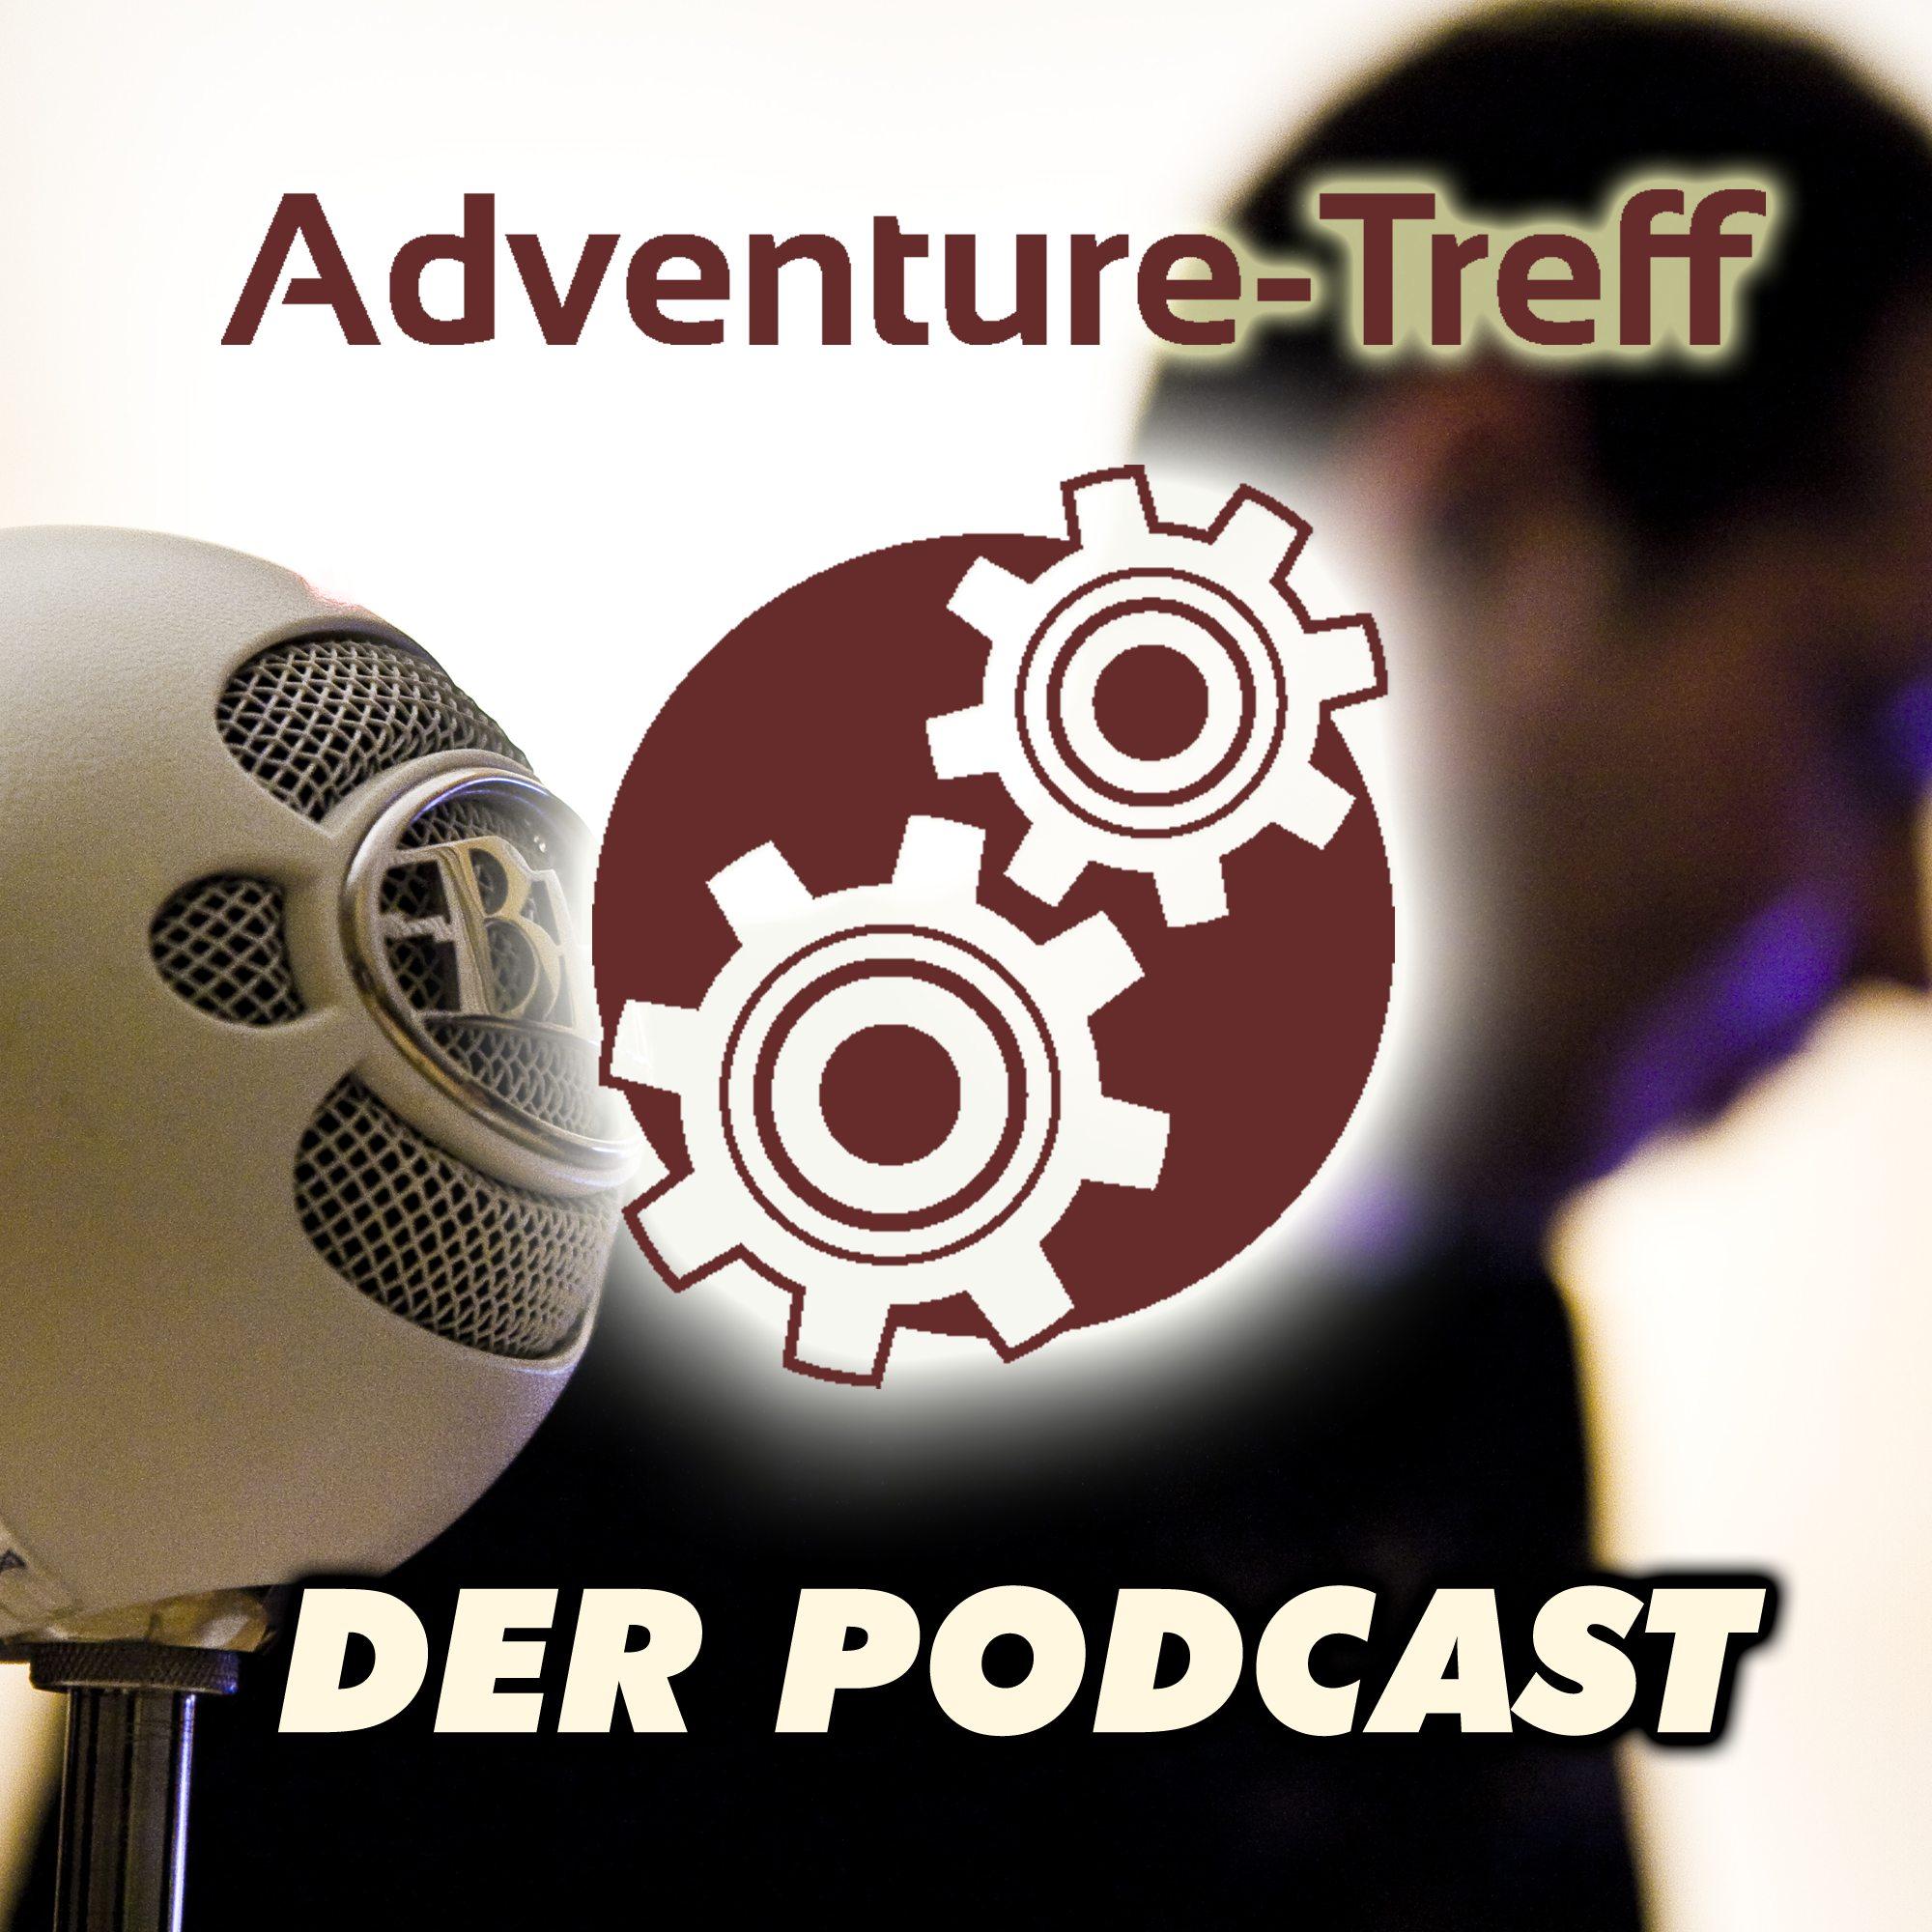 Adventure-Treff Podcast